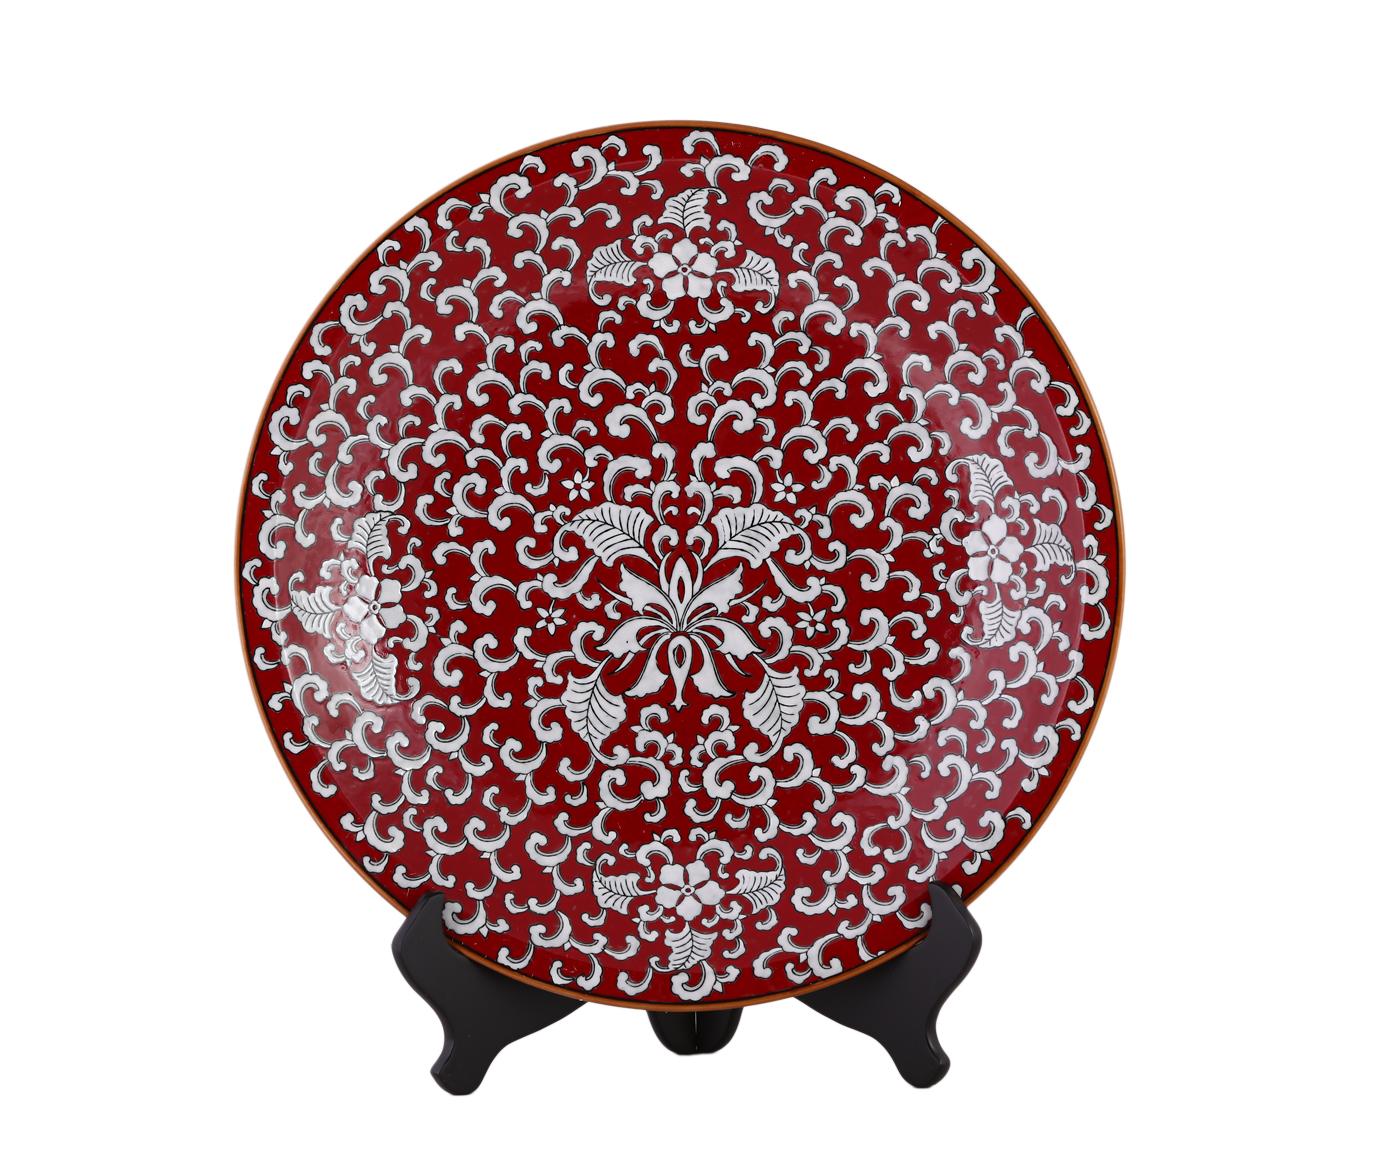 Декоративная тарелкаДекоративные тарелки<br><br><br>Material: Керамика<br>Depth см: 5,5<br>Diameter см: 45